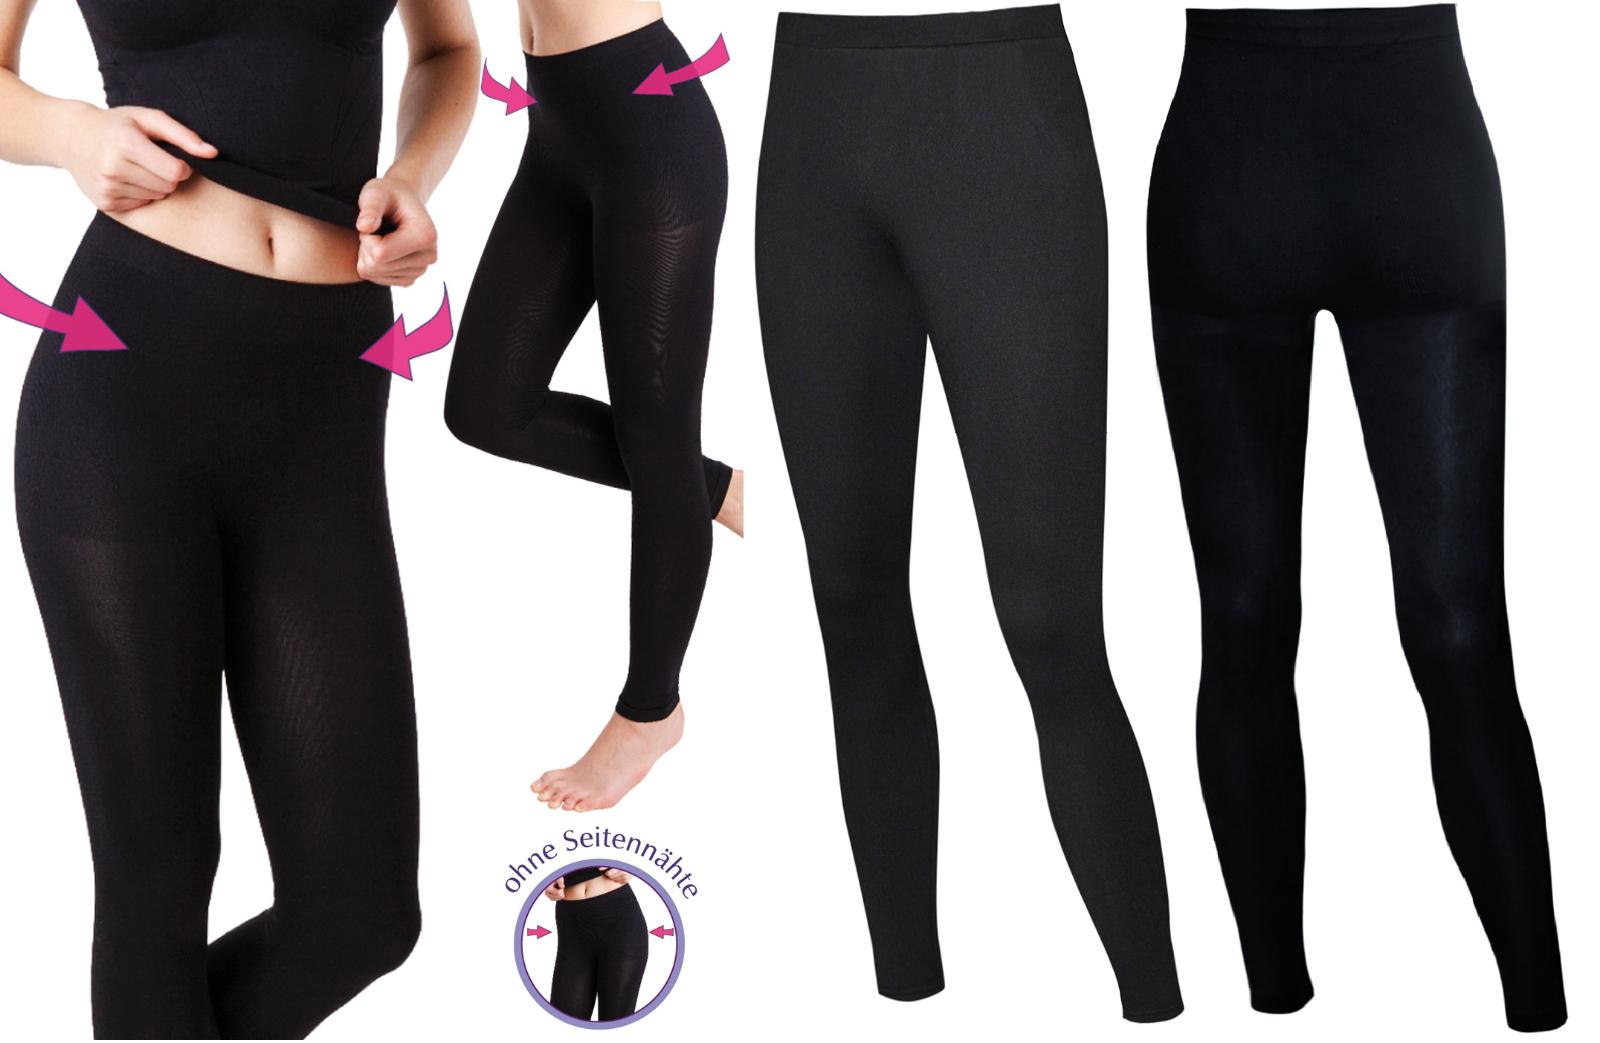 Damen Leggings Leggins schwarz schwarze blickdichte Seamless nahtlos formgebend